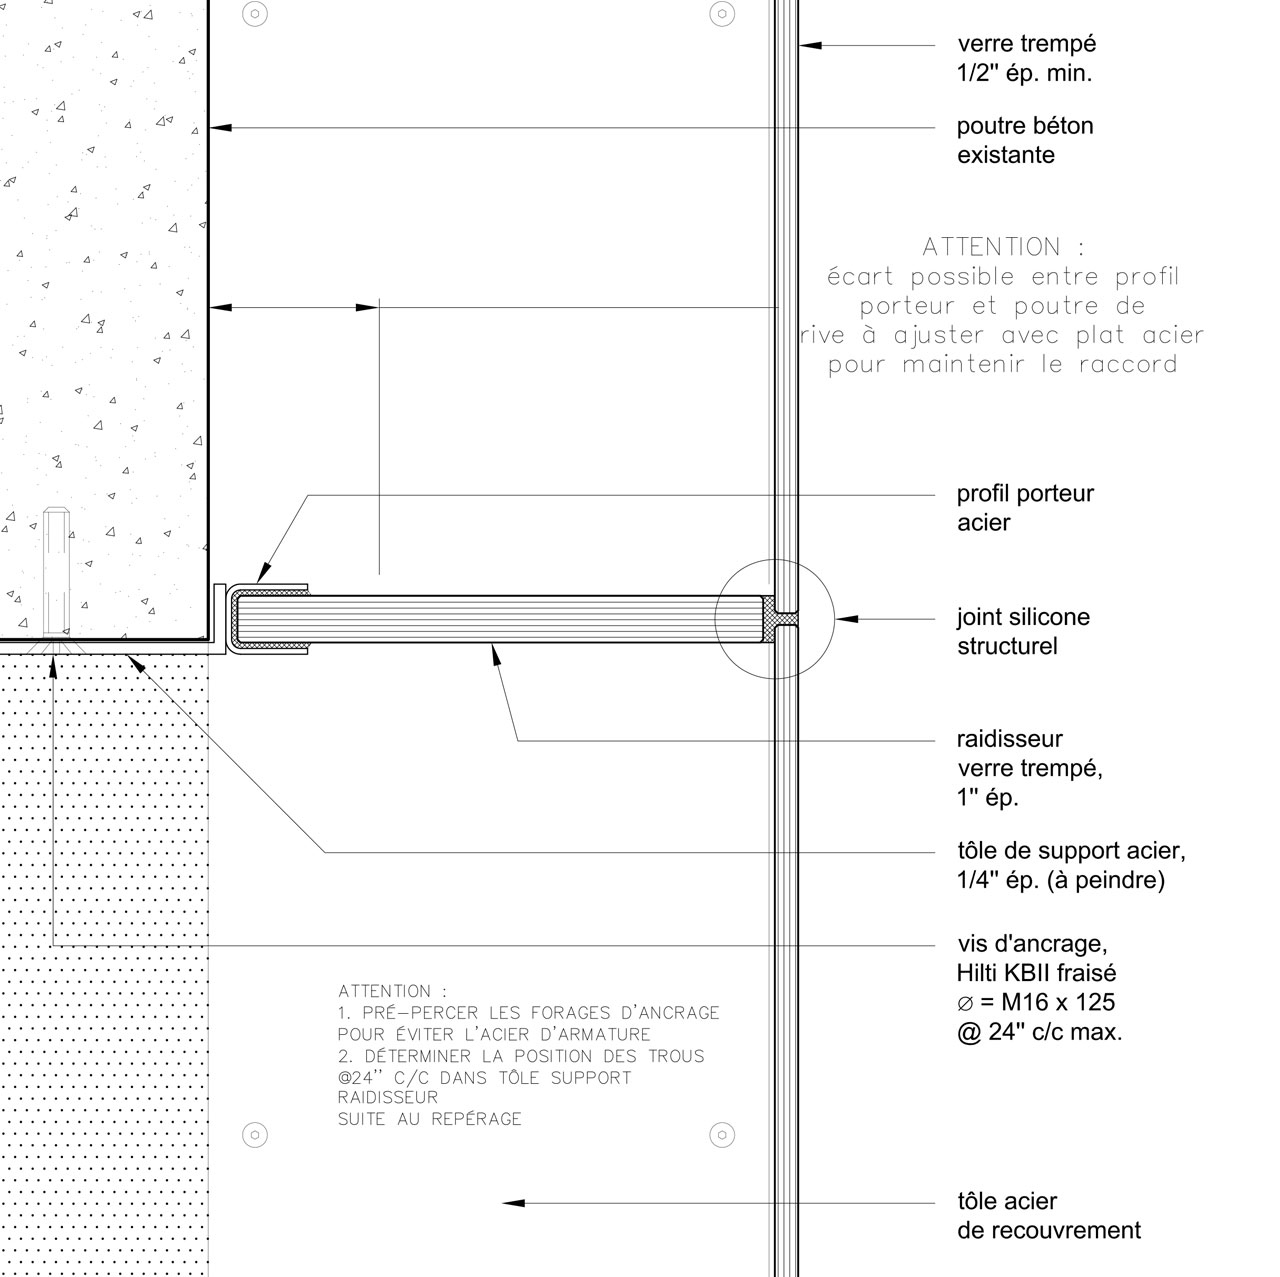 FASH-dessin-détail-cadre-vitrage_02.jpg